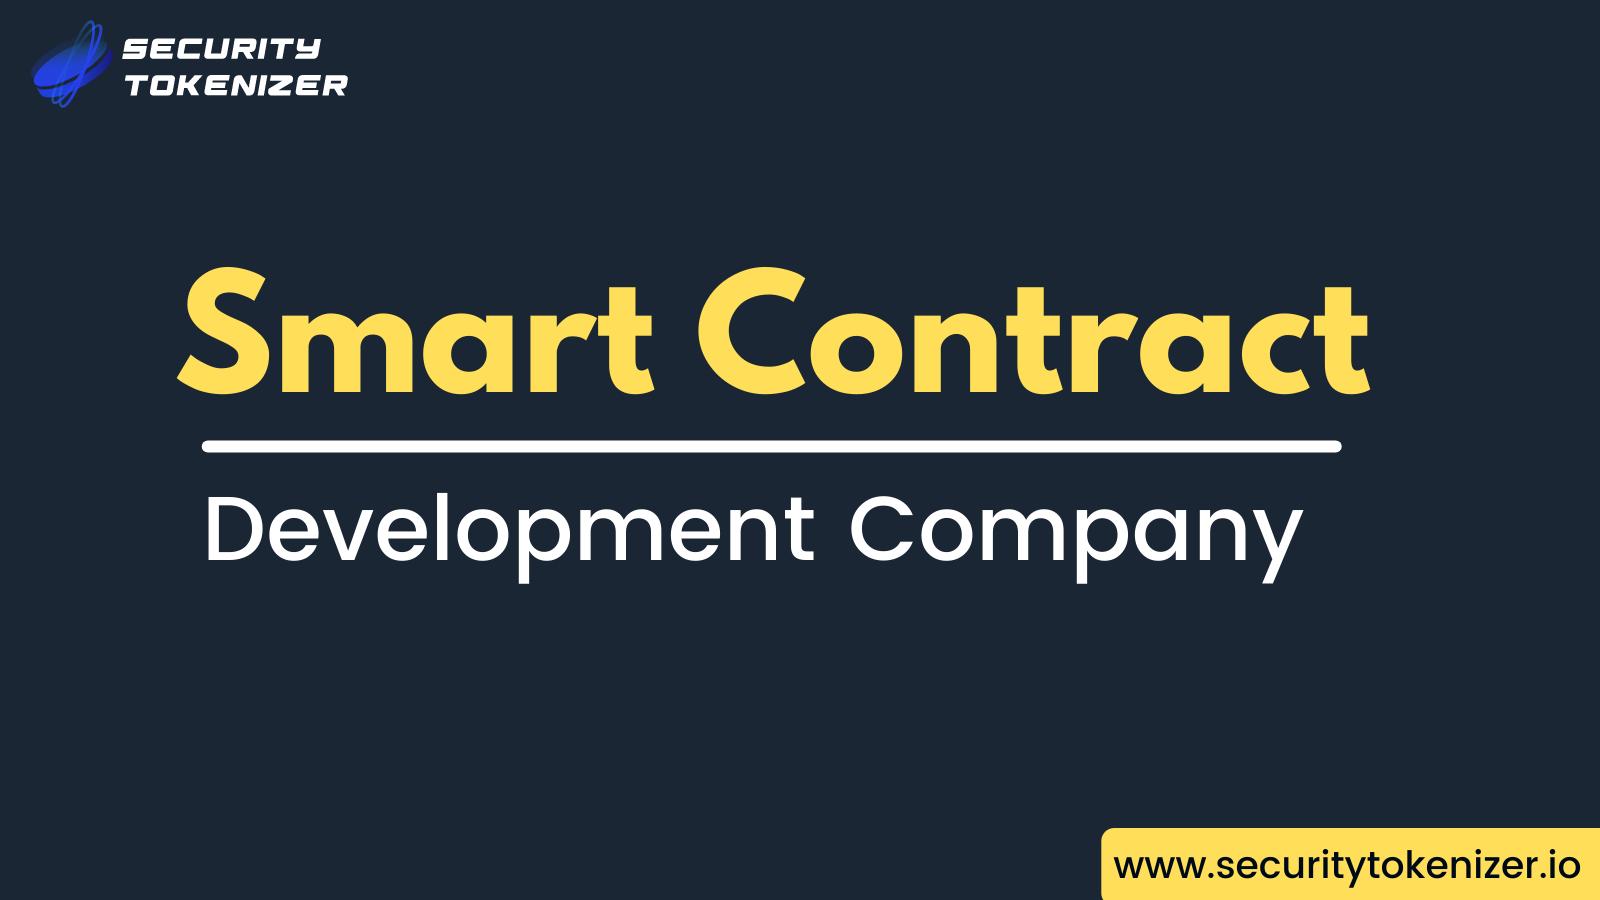 Smart Contract Development Company - Security Tokenizer